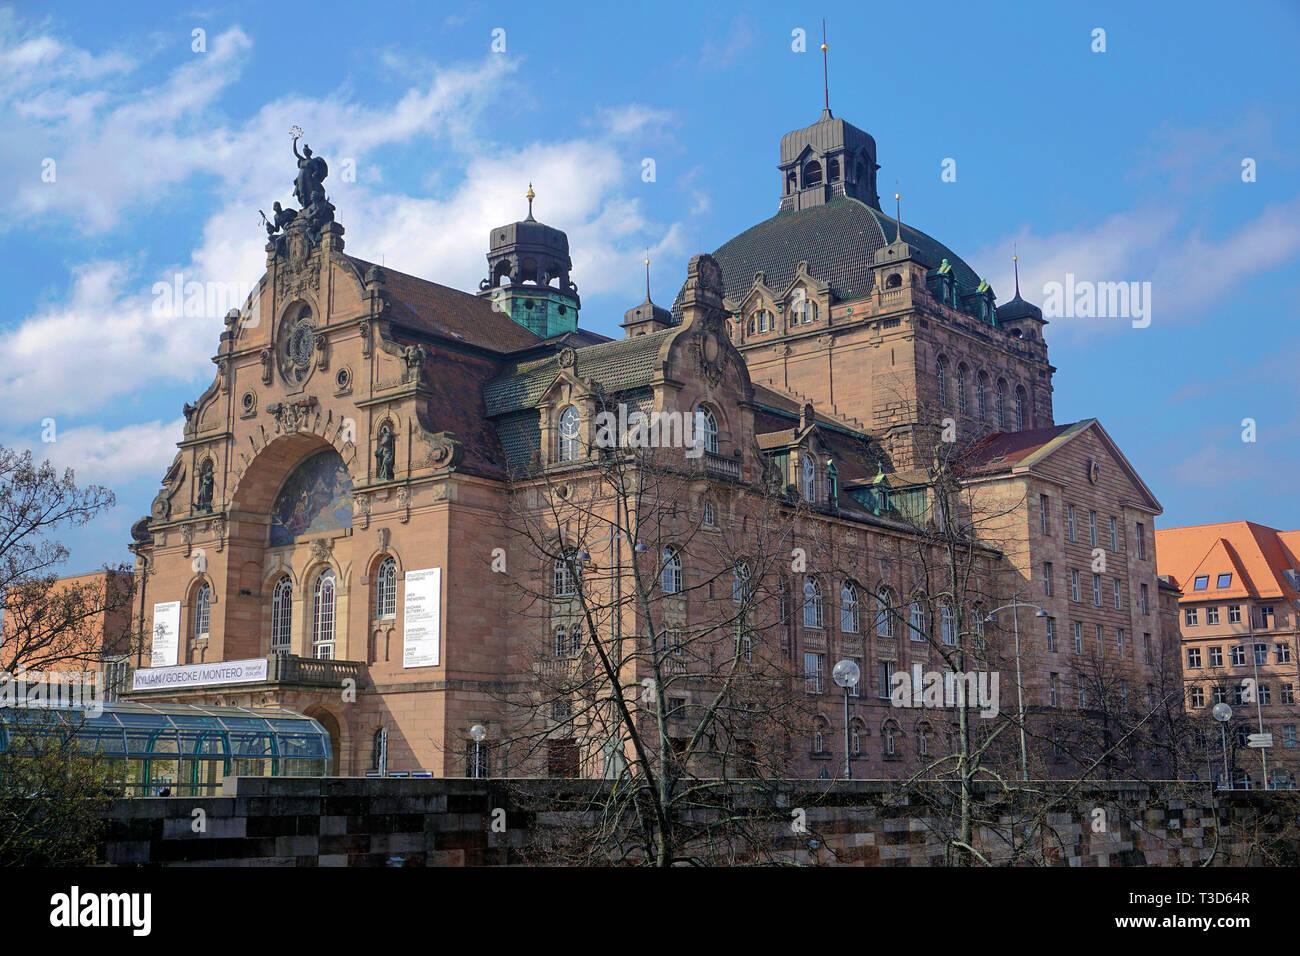 Opera house and state theatre, art nouveau style, Nuremberg, Franconia, Bavaria, Germany - Stock Image